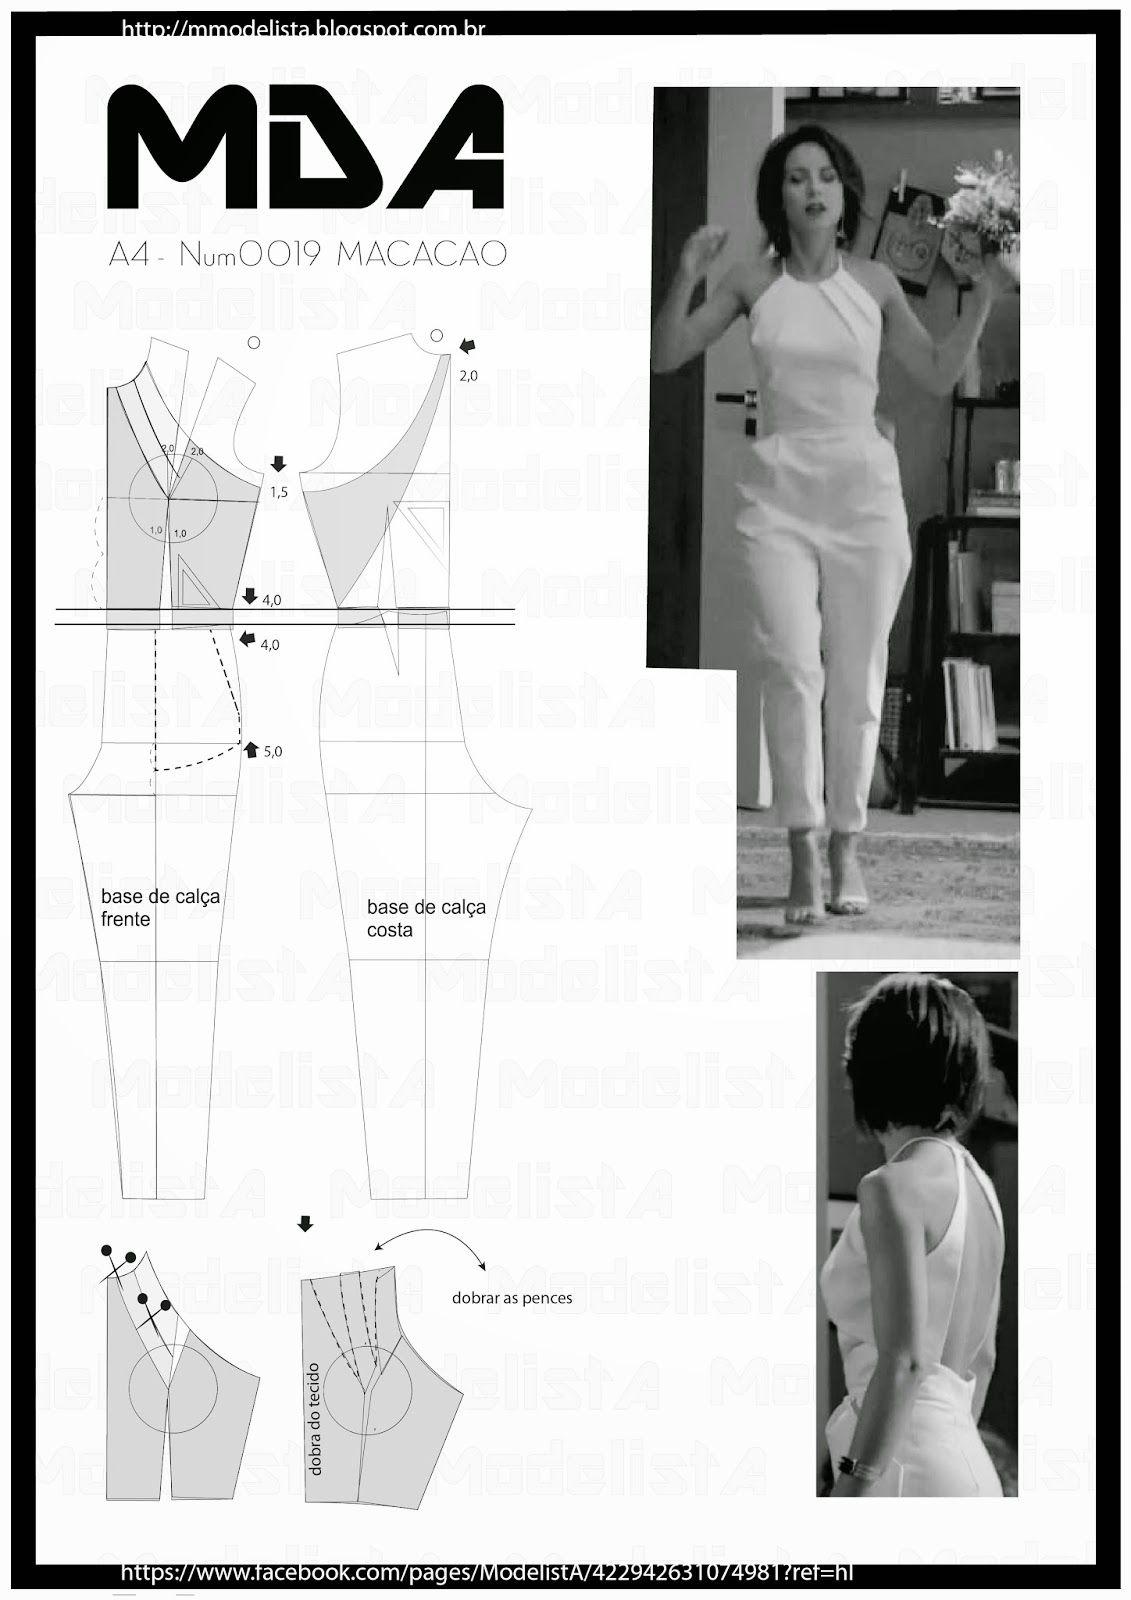 A4 - NUM 0019 - MACACÃO   Molde, Costura y Patrones